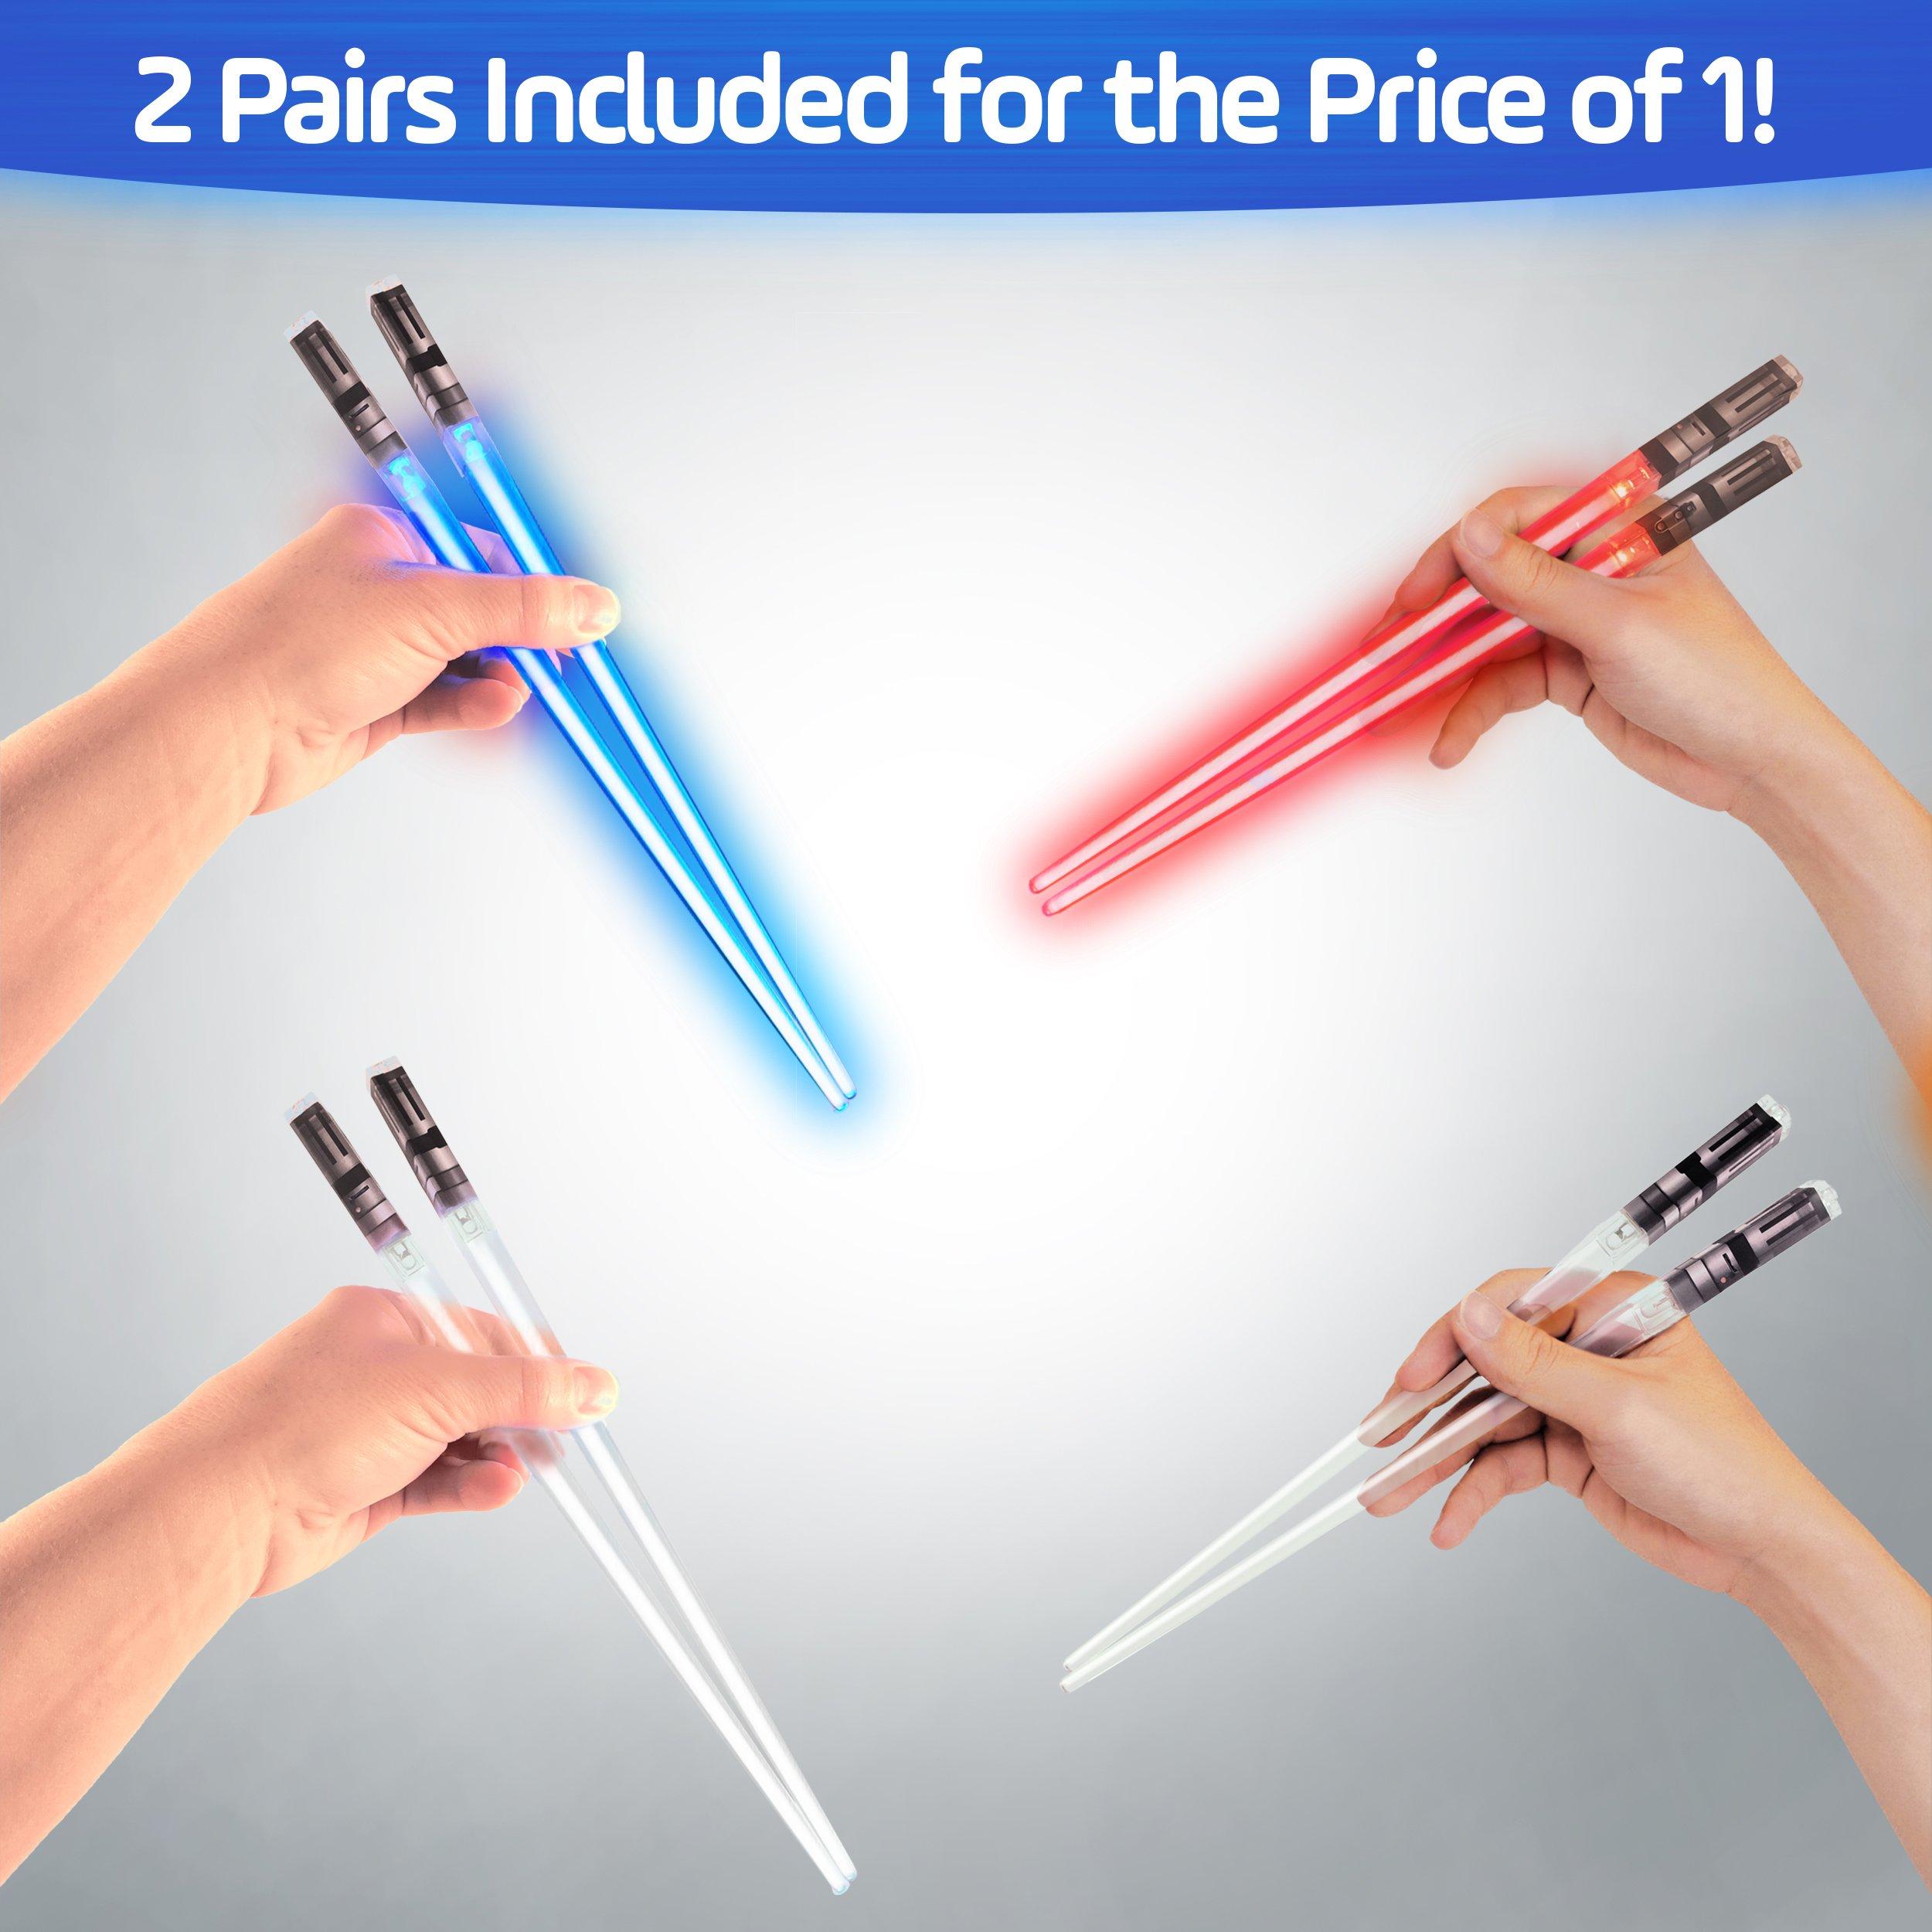 Sabers Chop Lightsaber Led Light Up Chopsticks 2 Pair Red Blue by Chopsabers (Image #4)